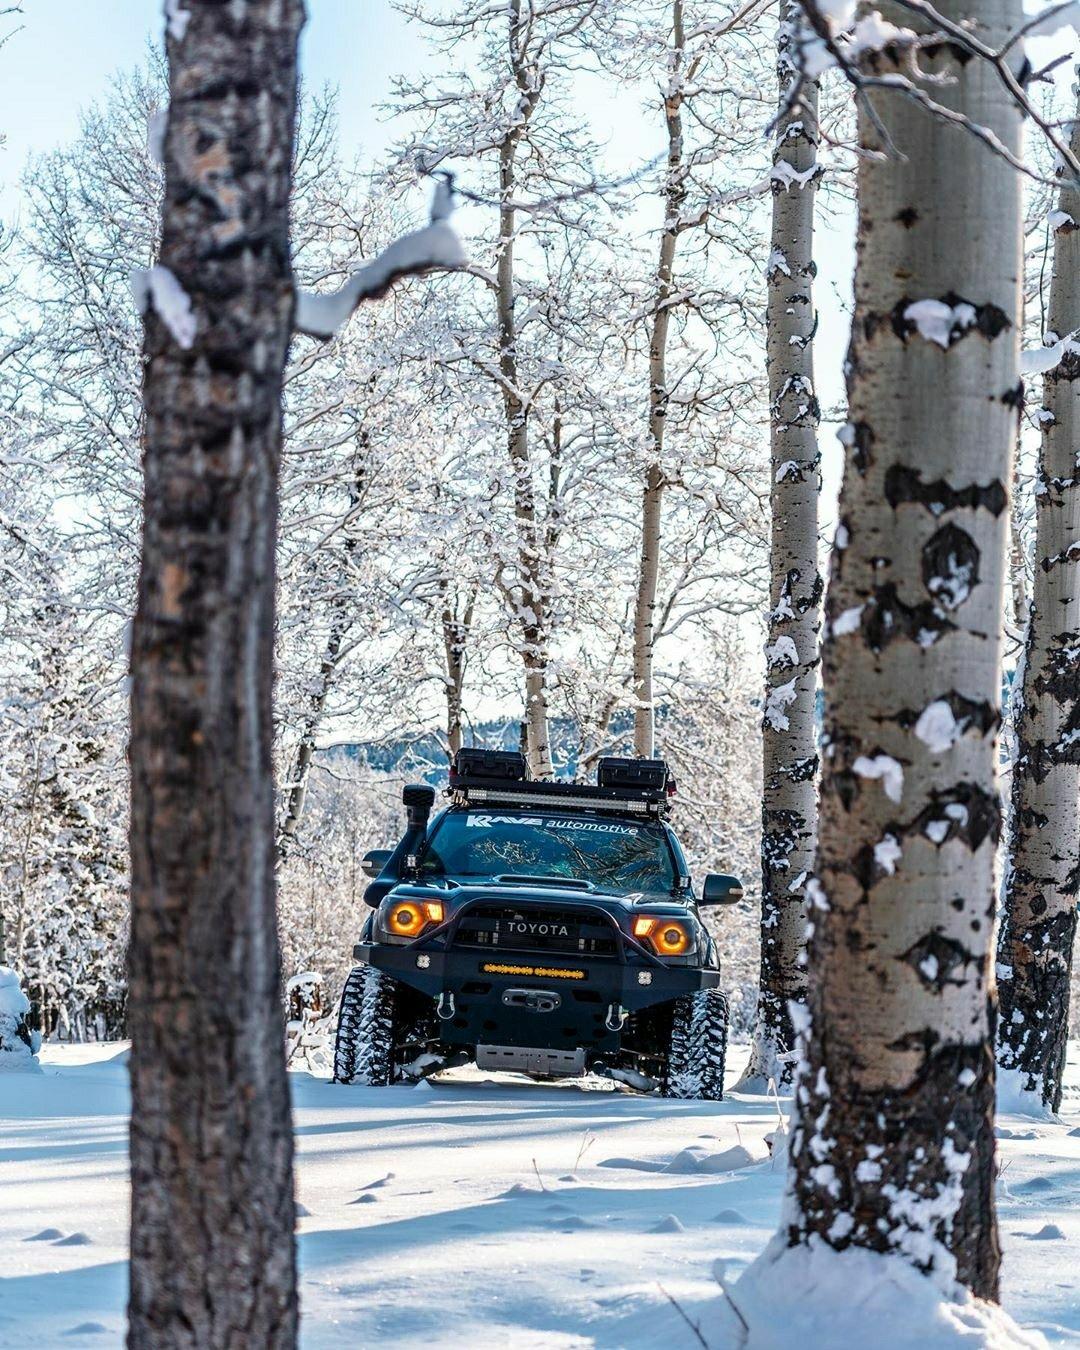 toyota truck in snowy woods